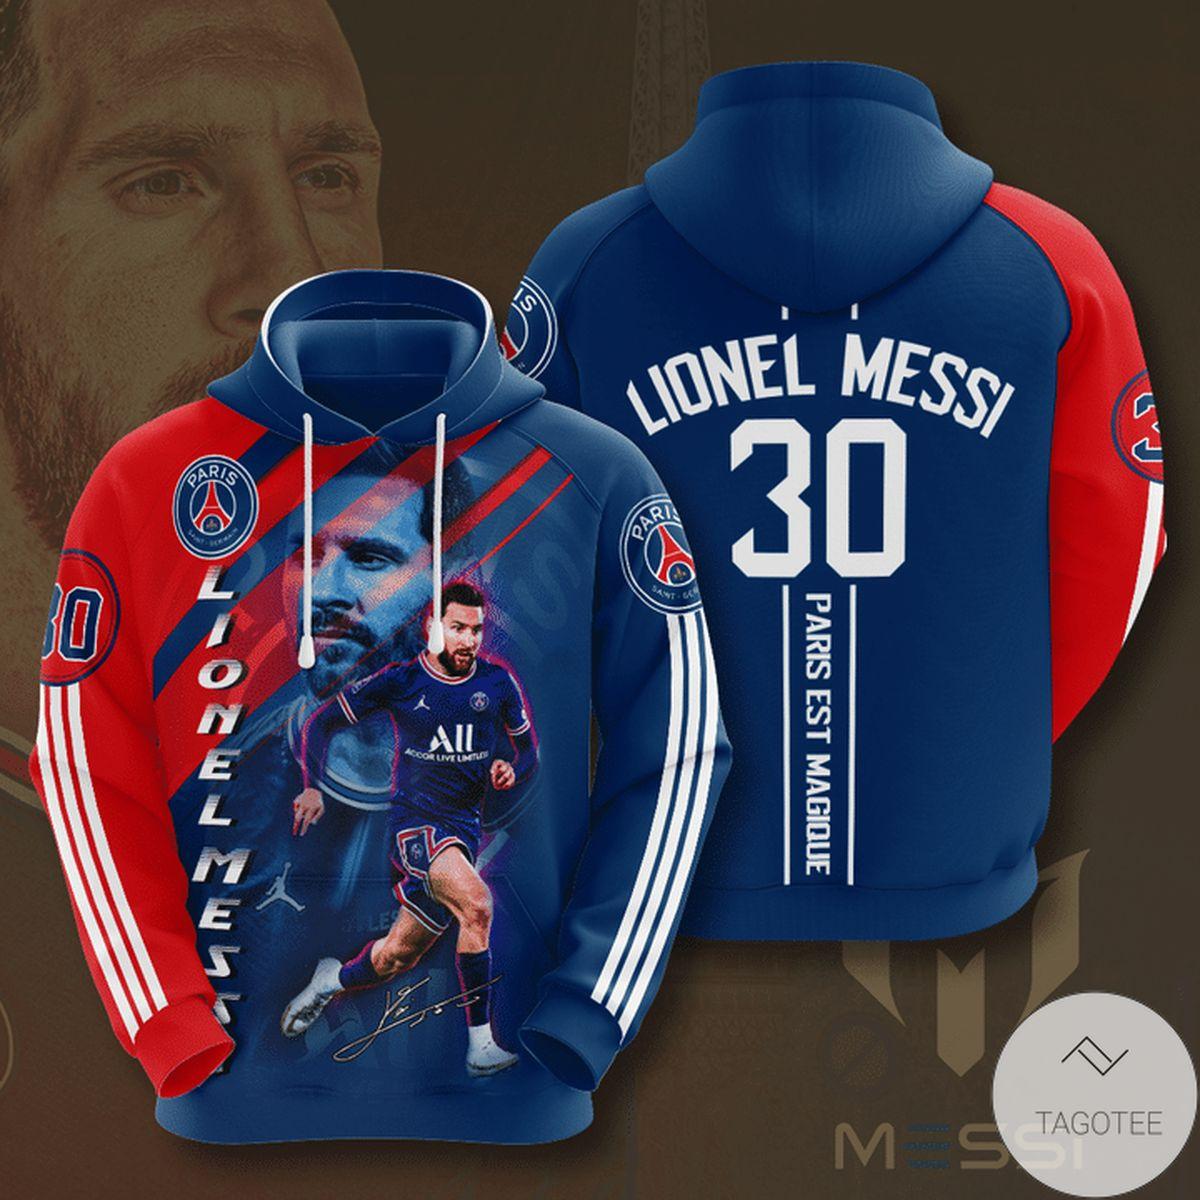 Lionel Messi 30 Paris Saint Germain 3d Hoodie